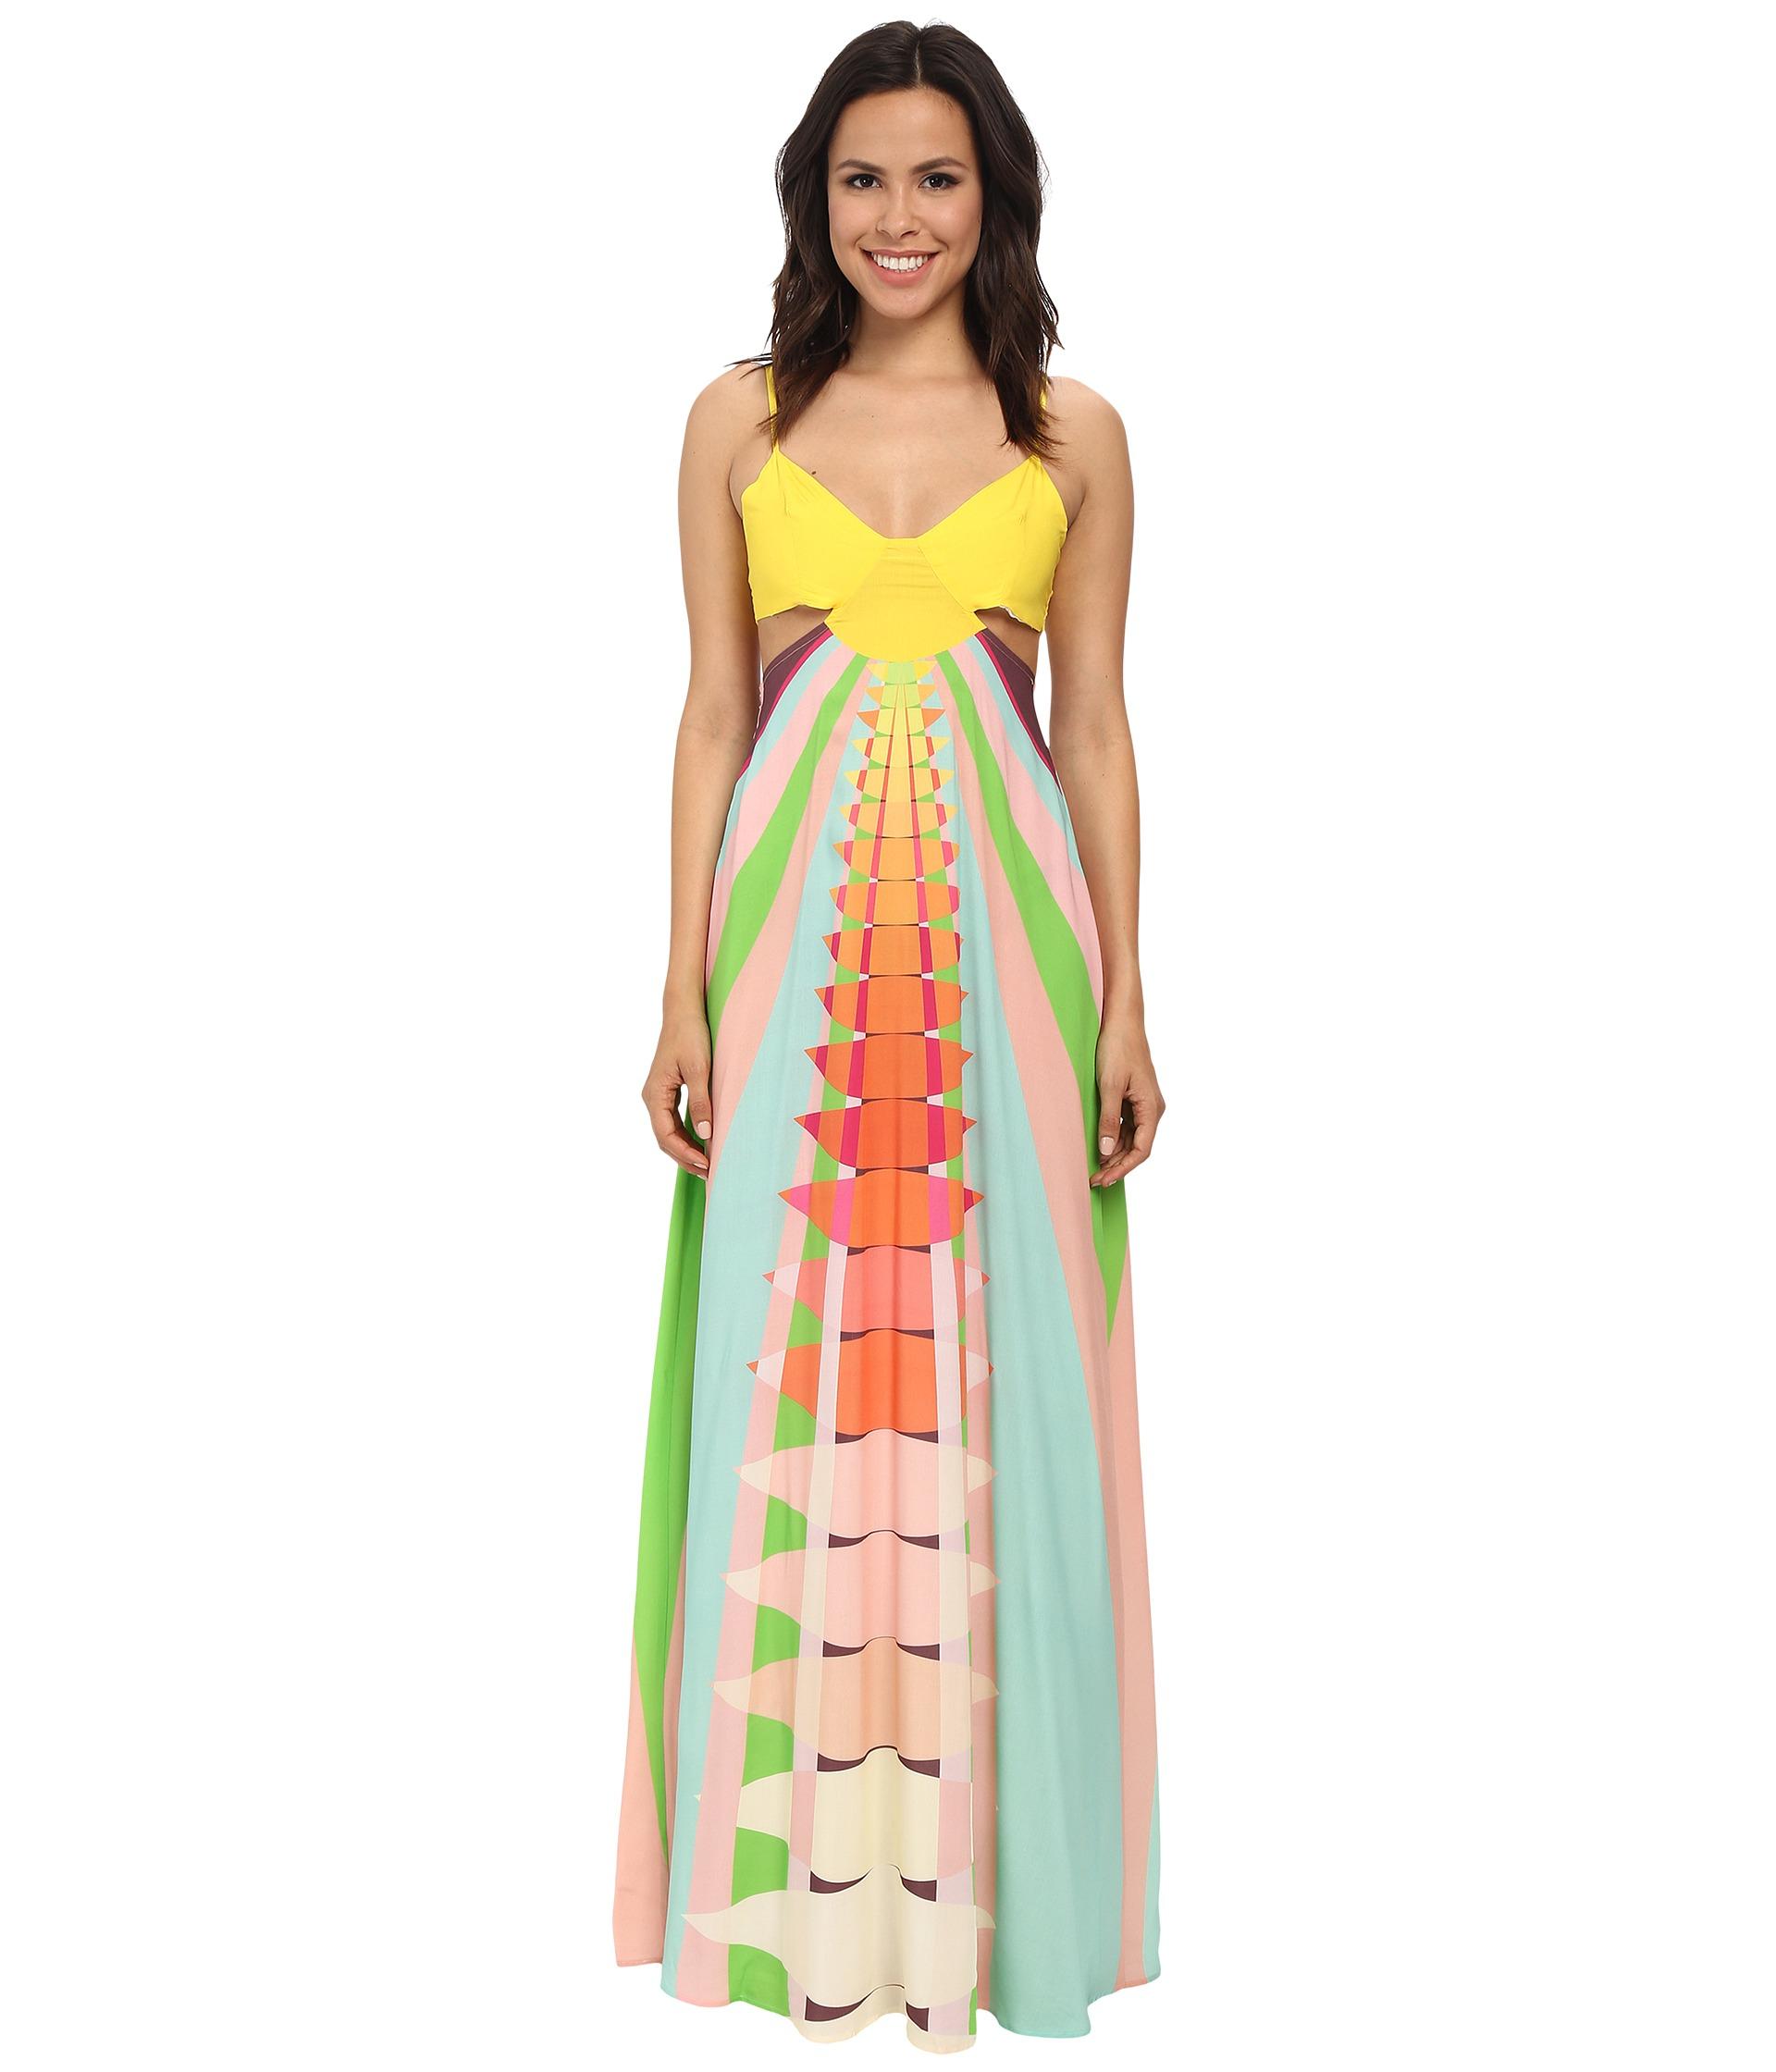 d0788e5483 Mara Hoffman Cutout Maxi Dress - Lyst